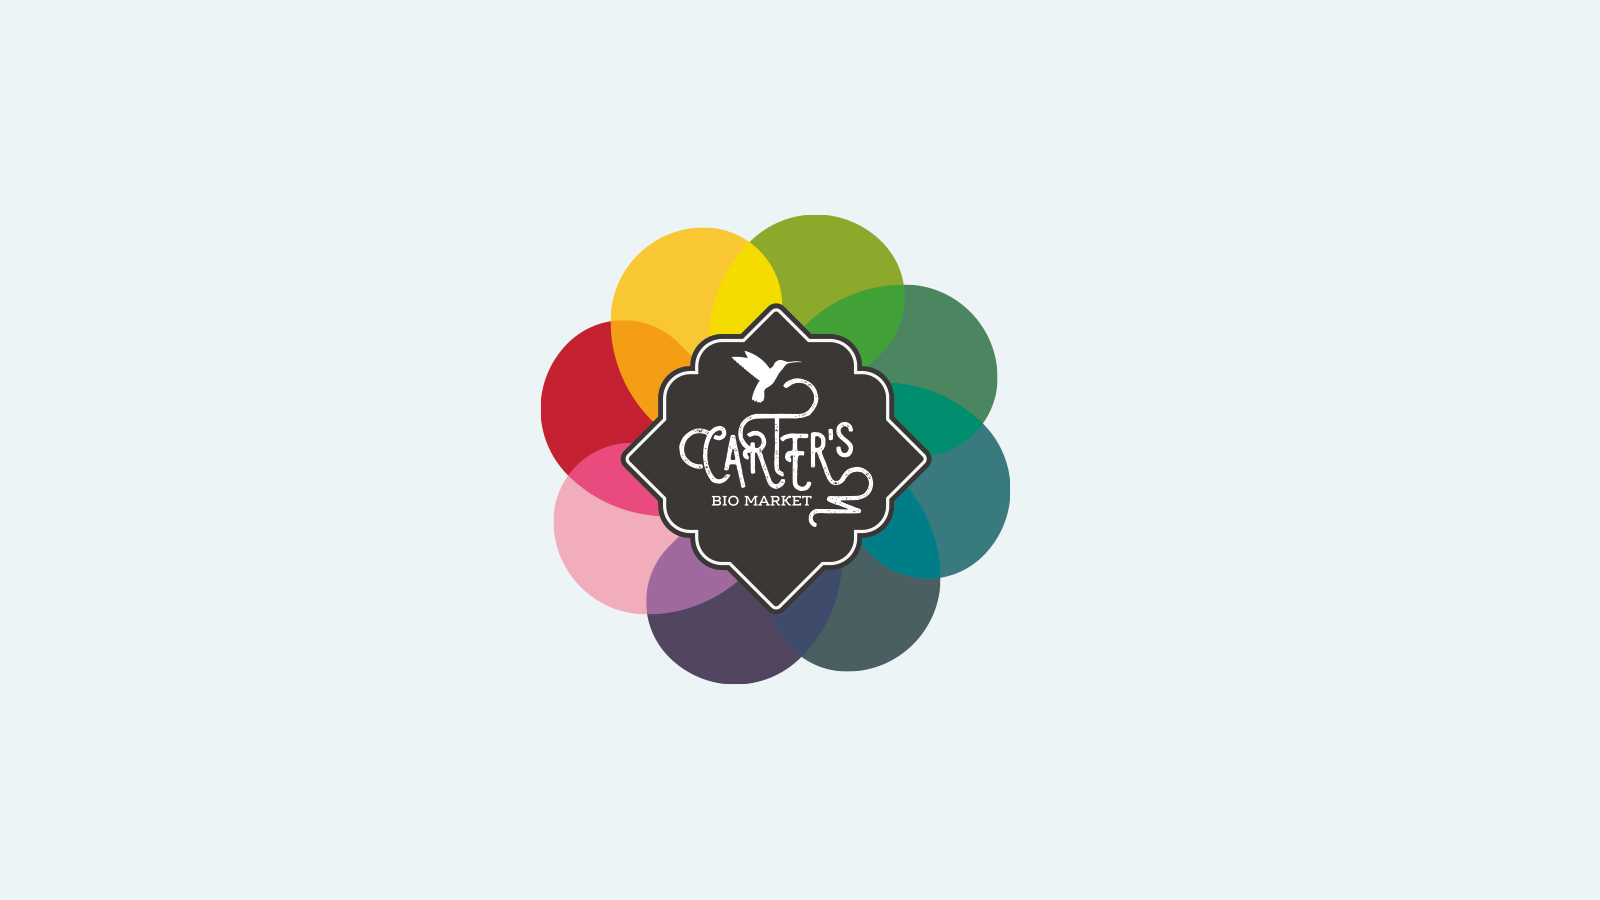 Carter's Bio 2.jpg